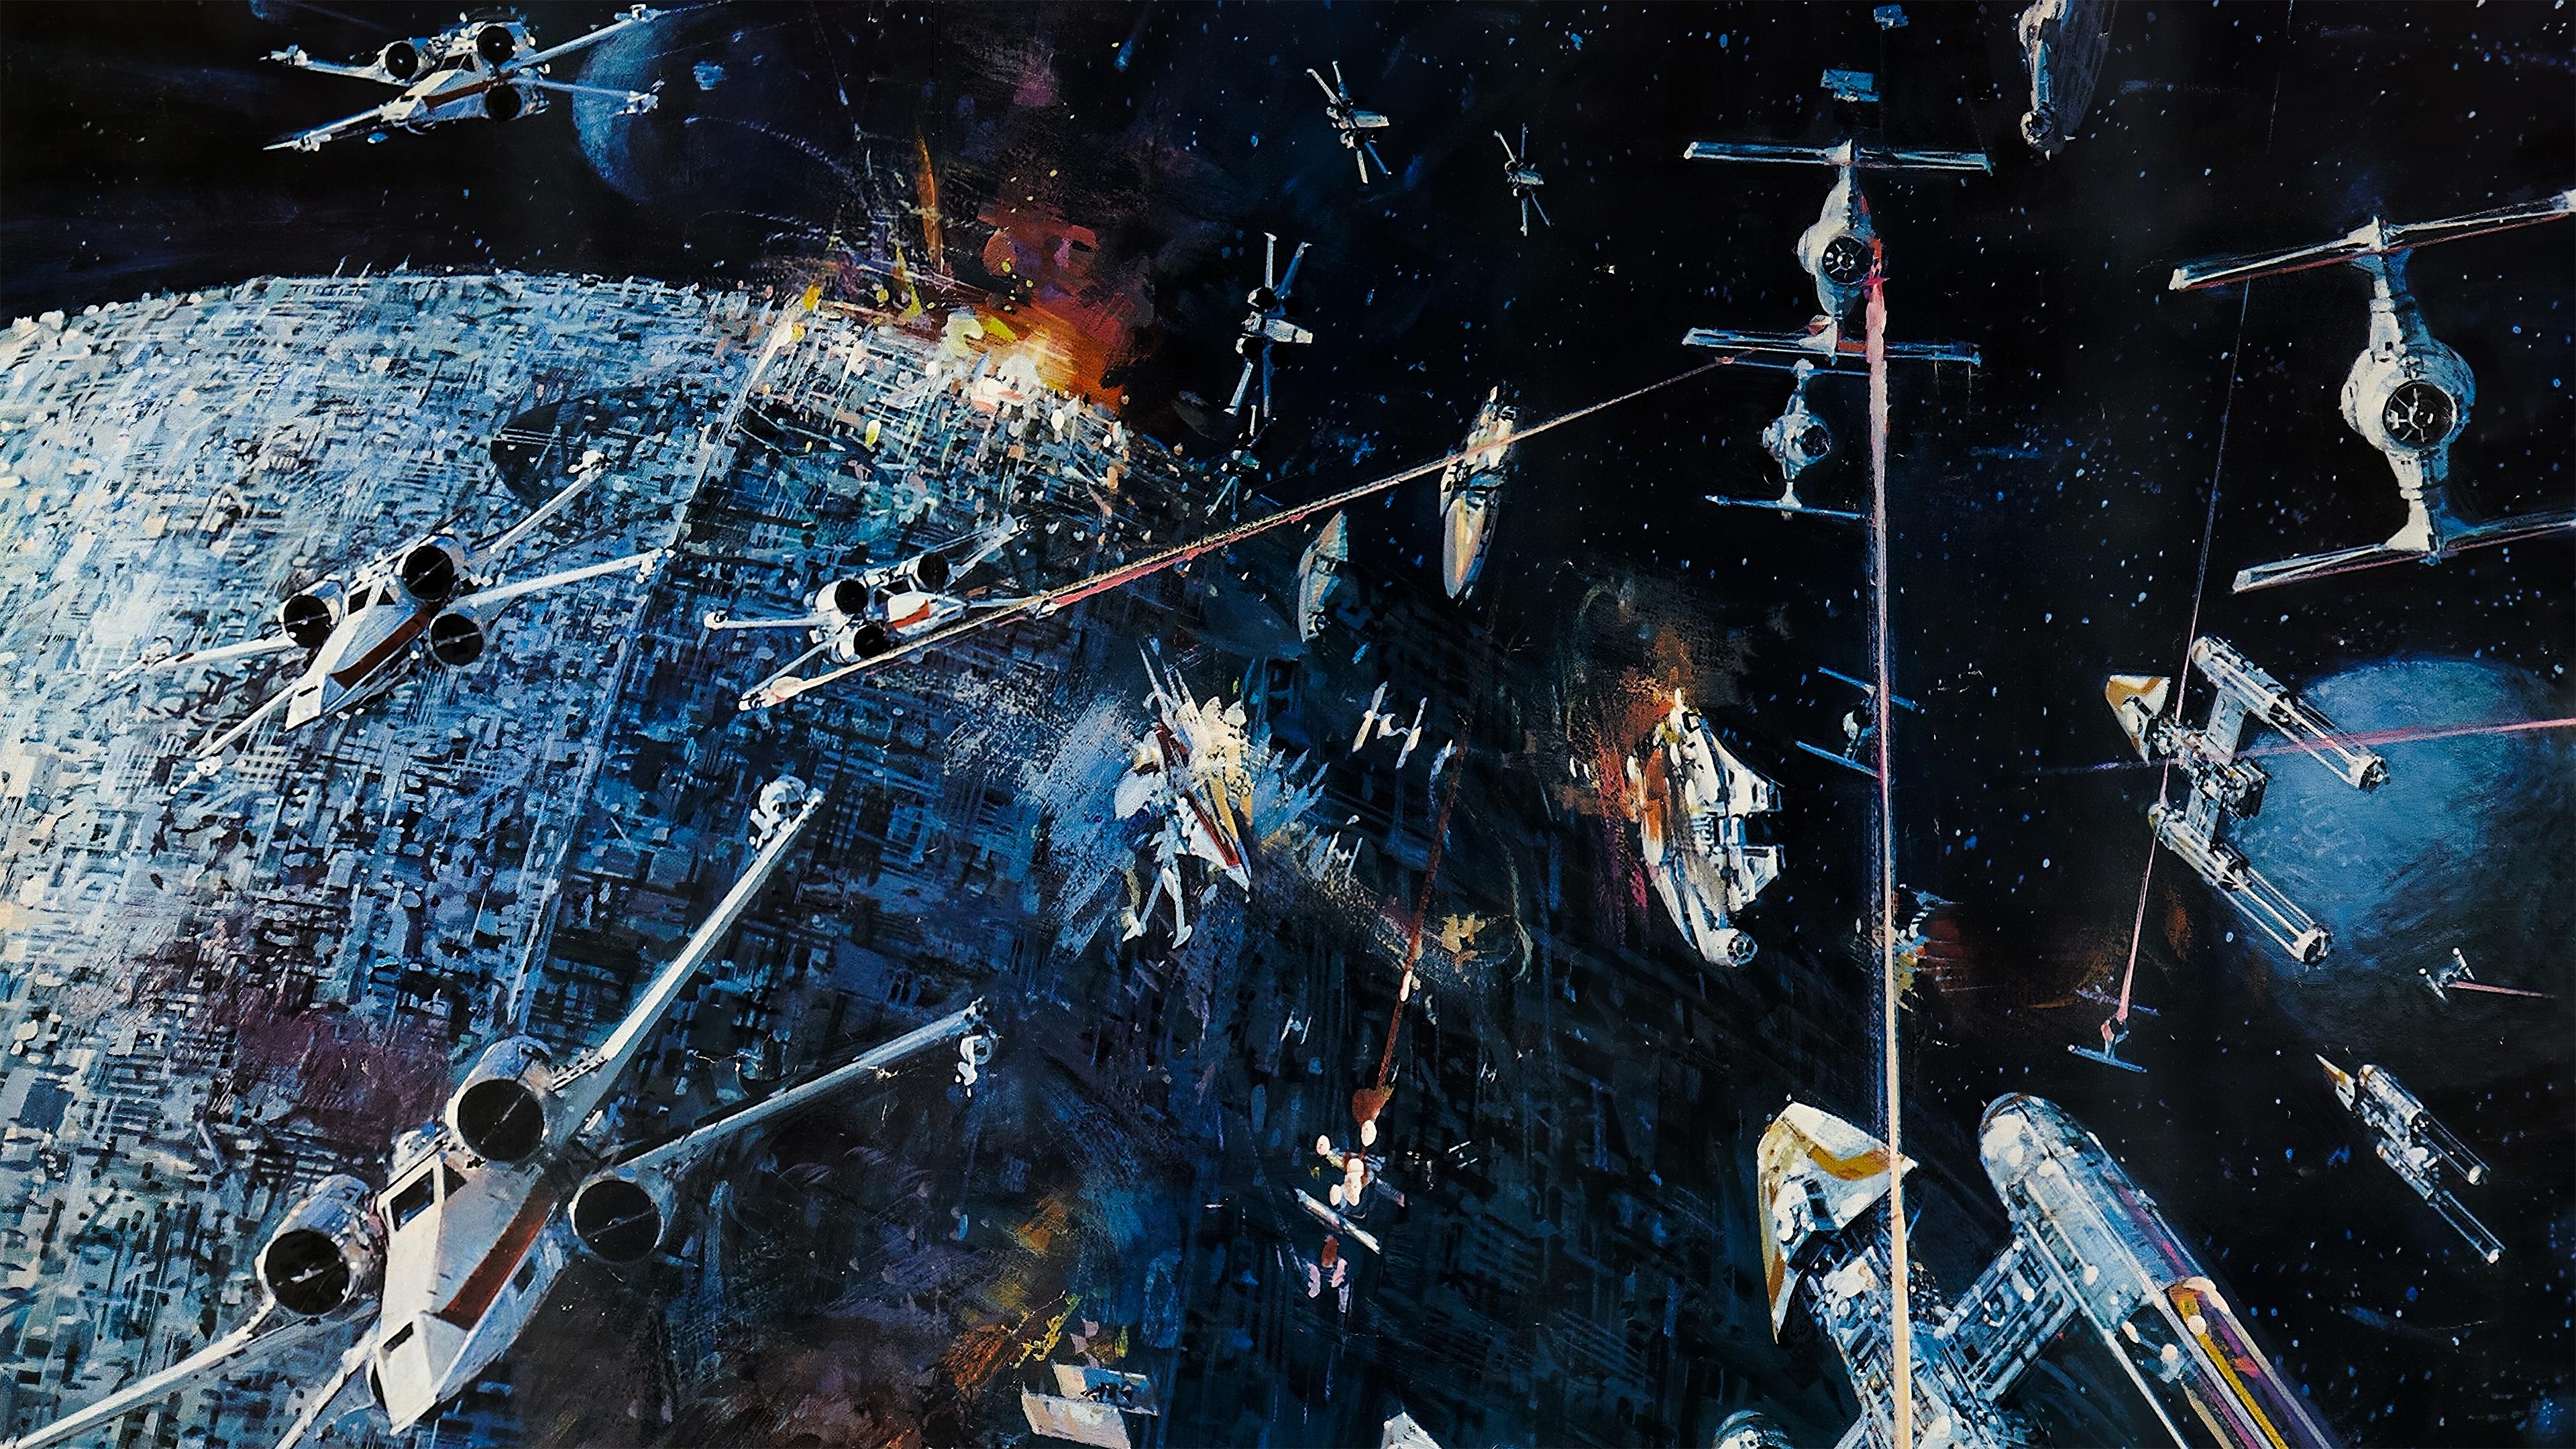 star wars 1977 poster 8o